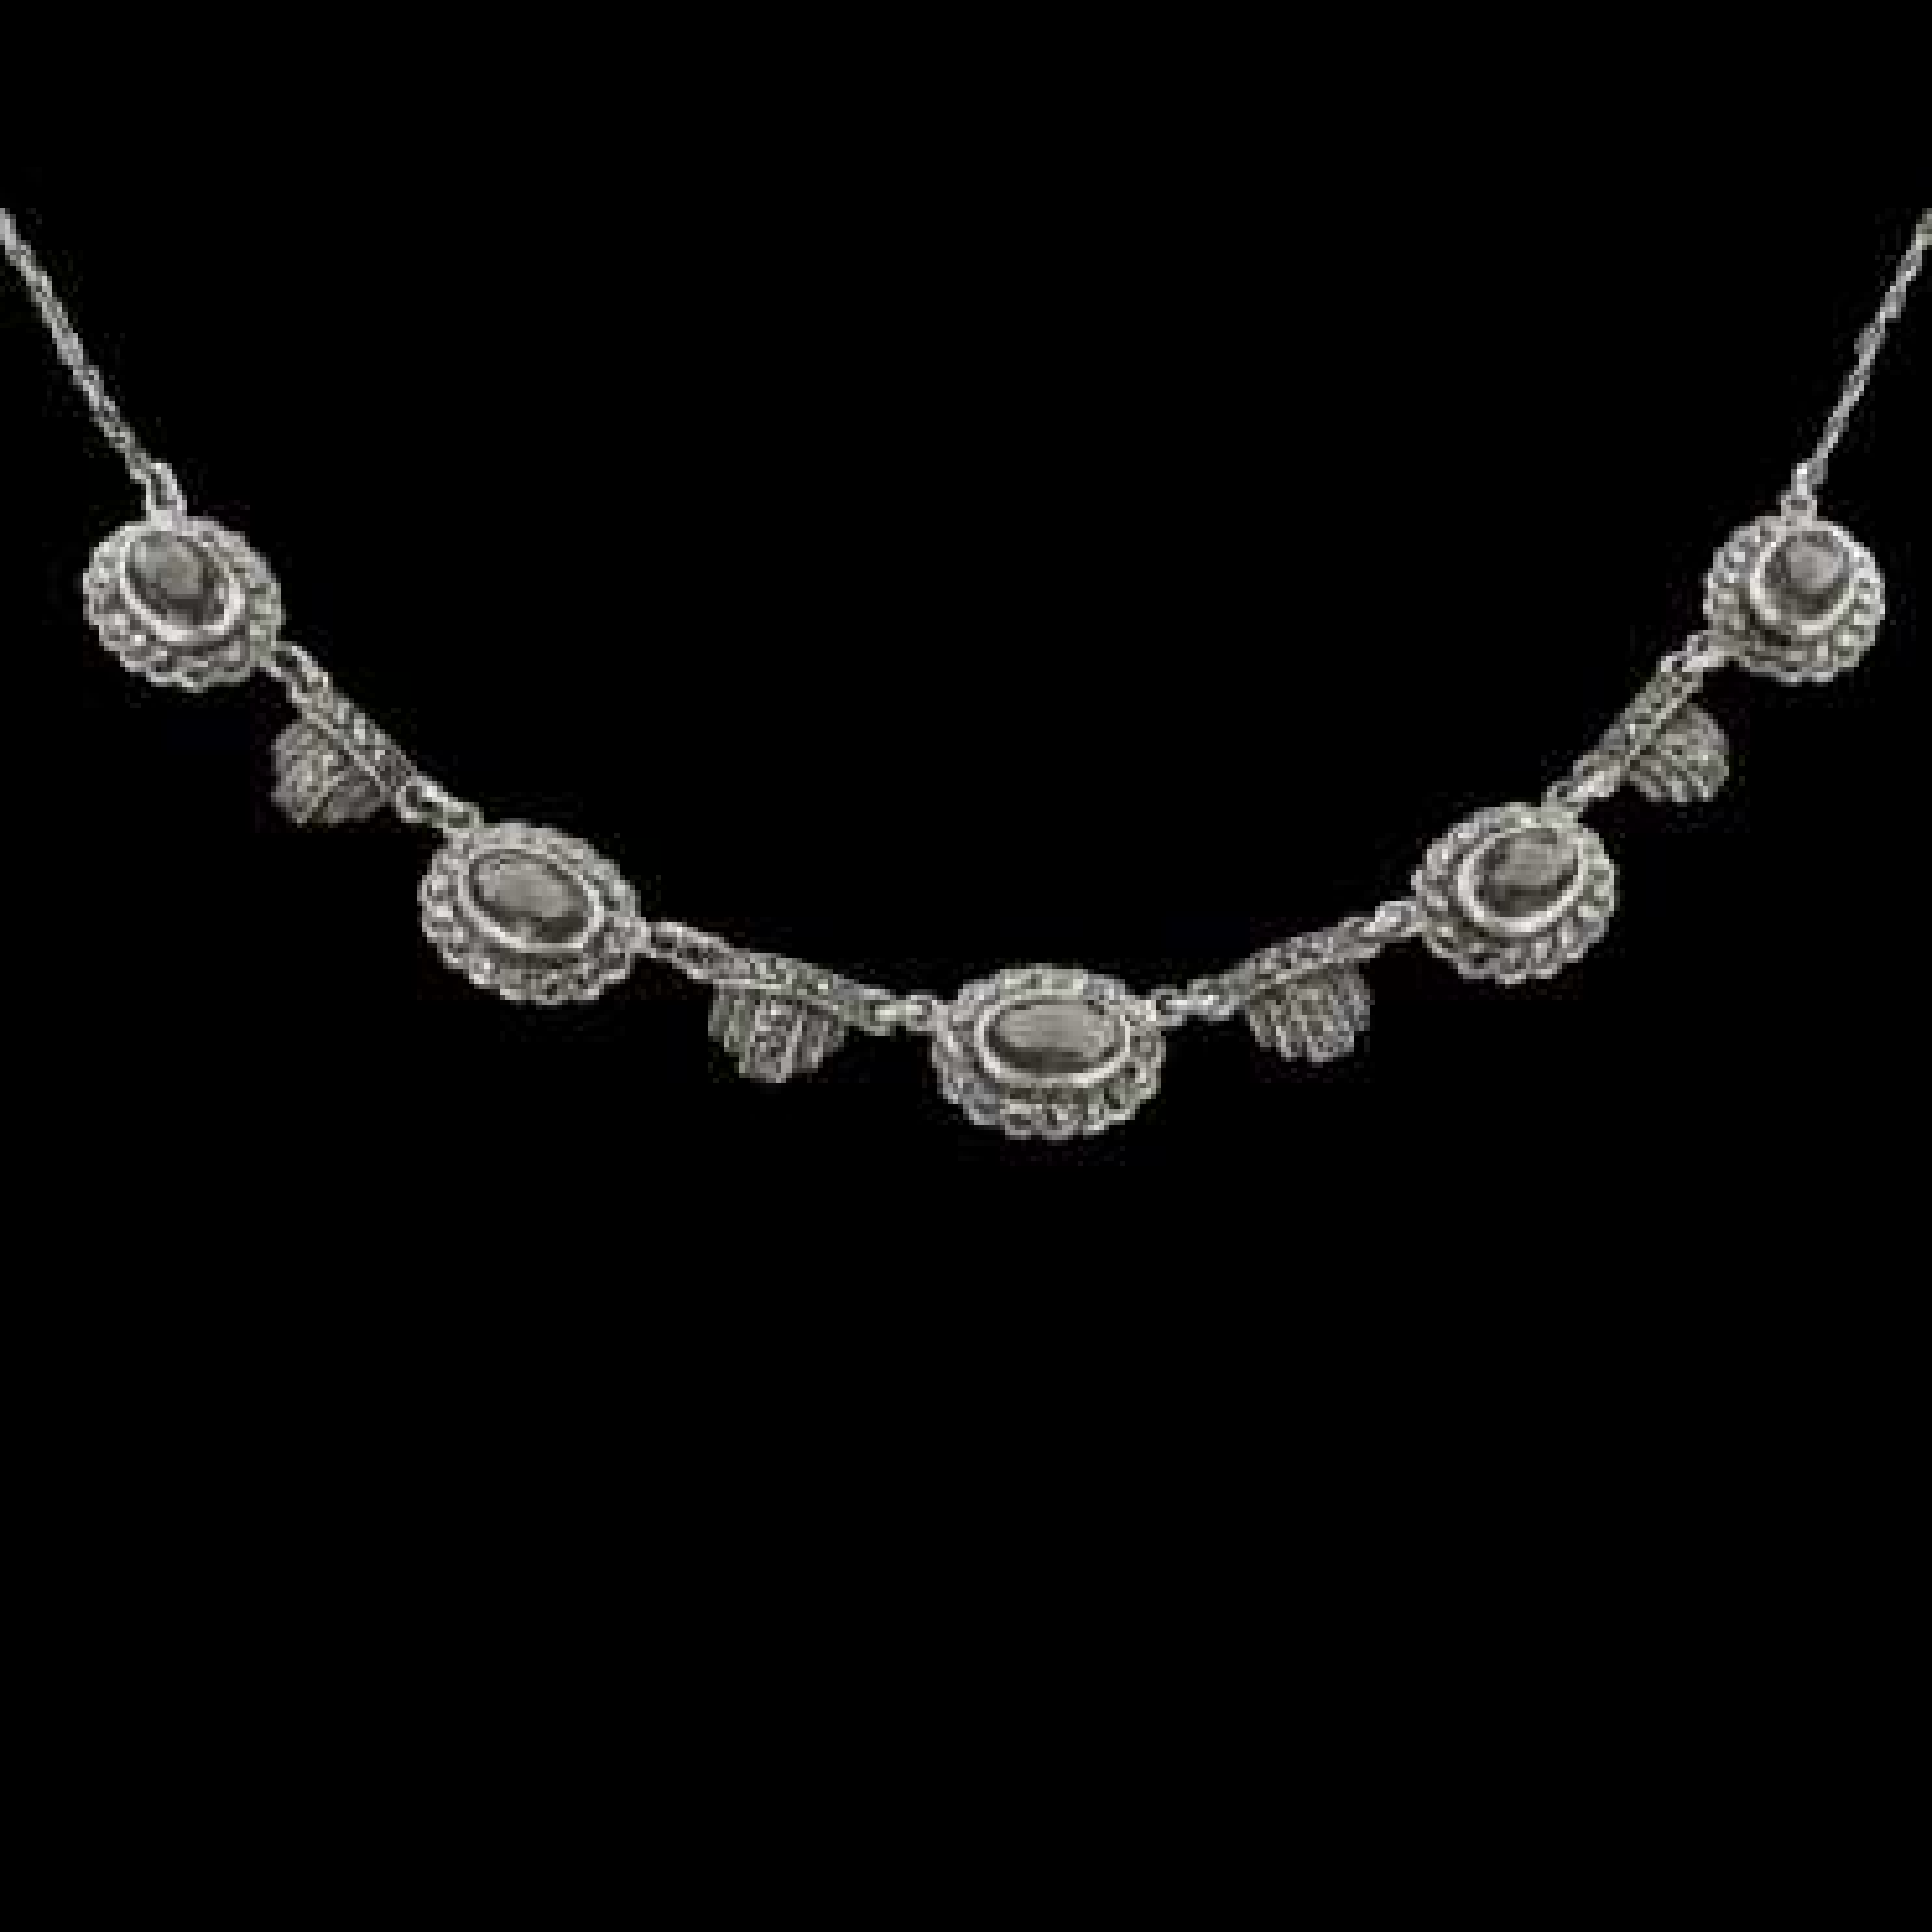 Ladies Shipton and Co Exclusive Silver and Smokey Quartz Necklace NQ0775SQ